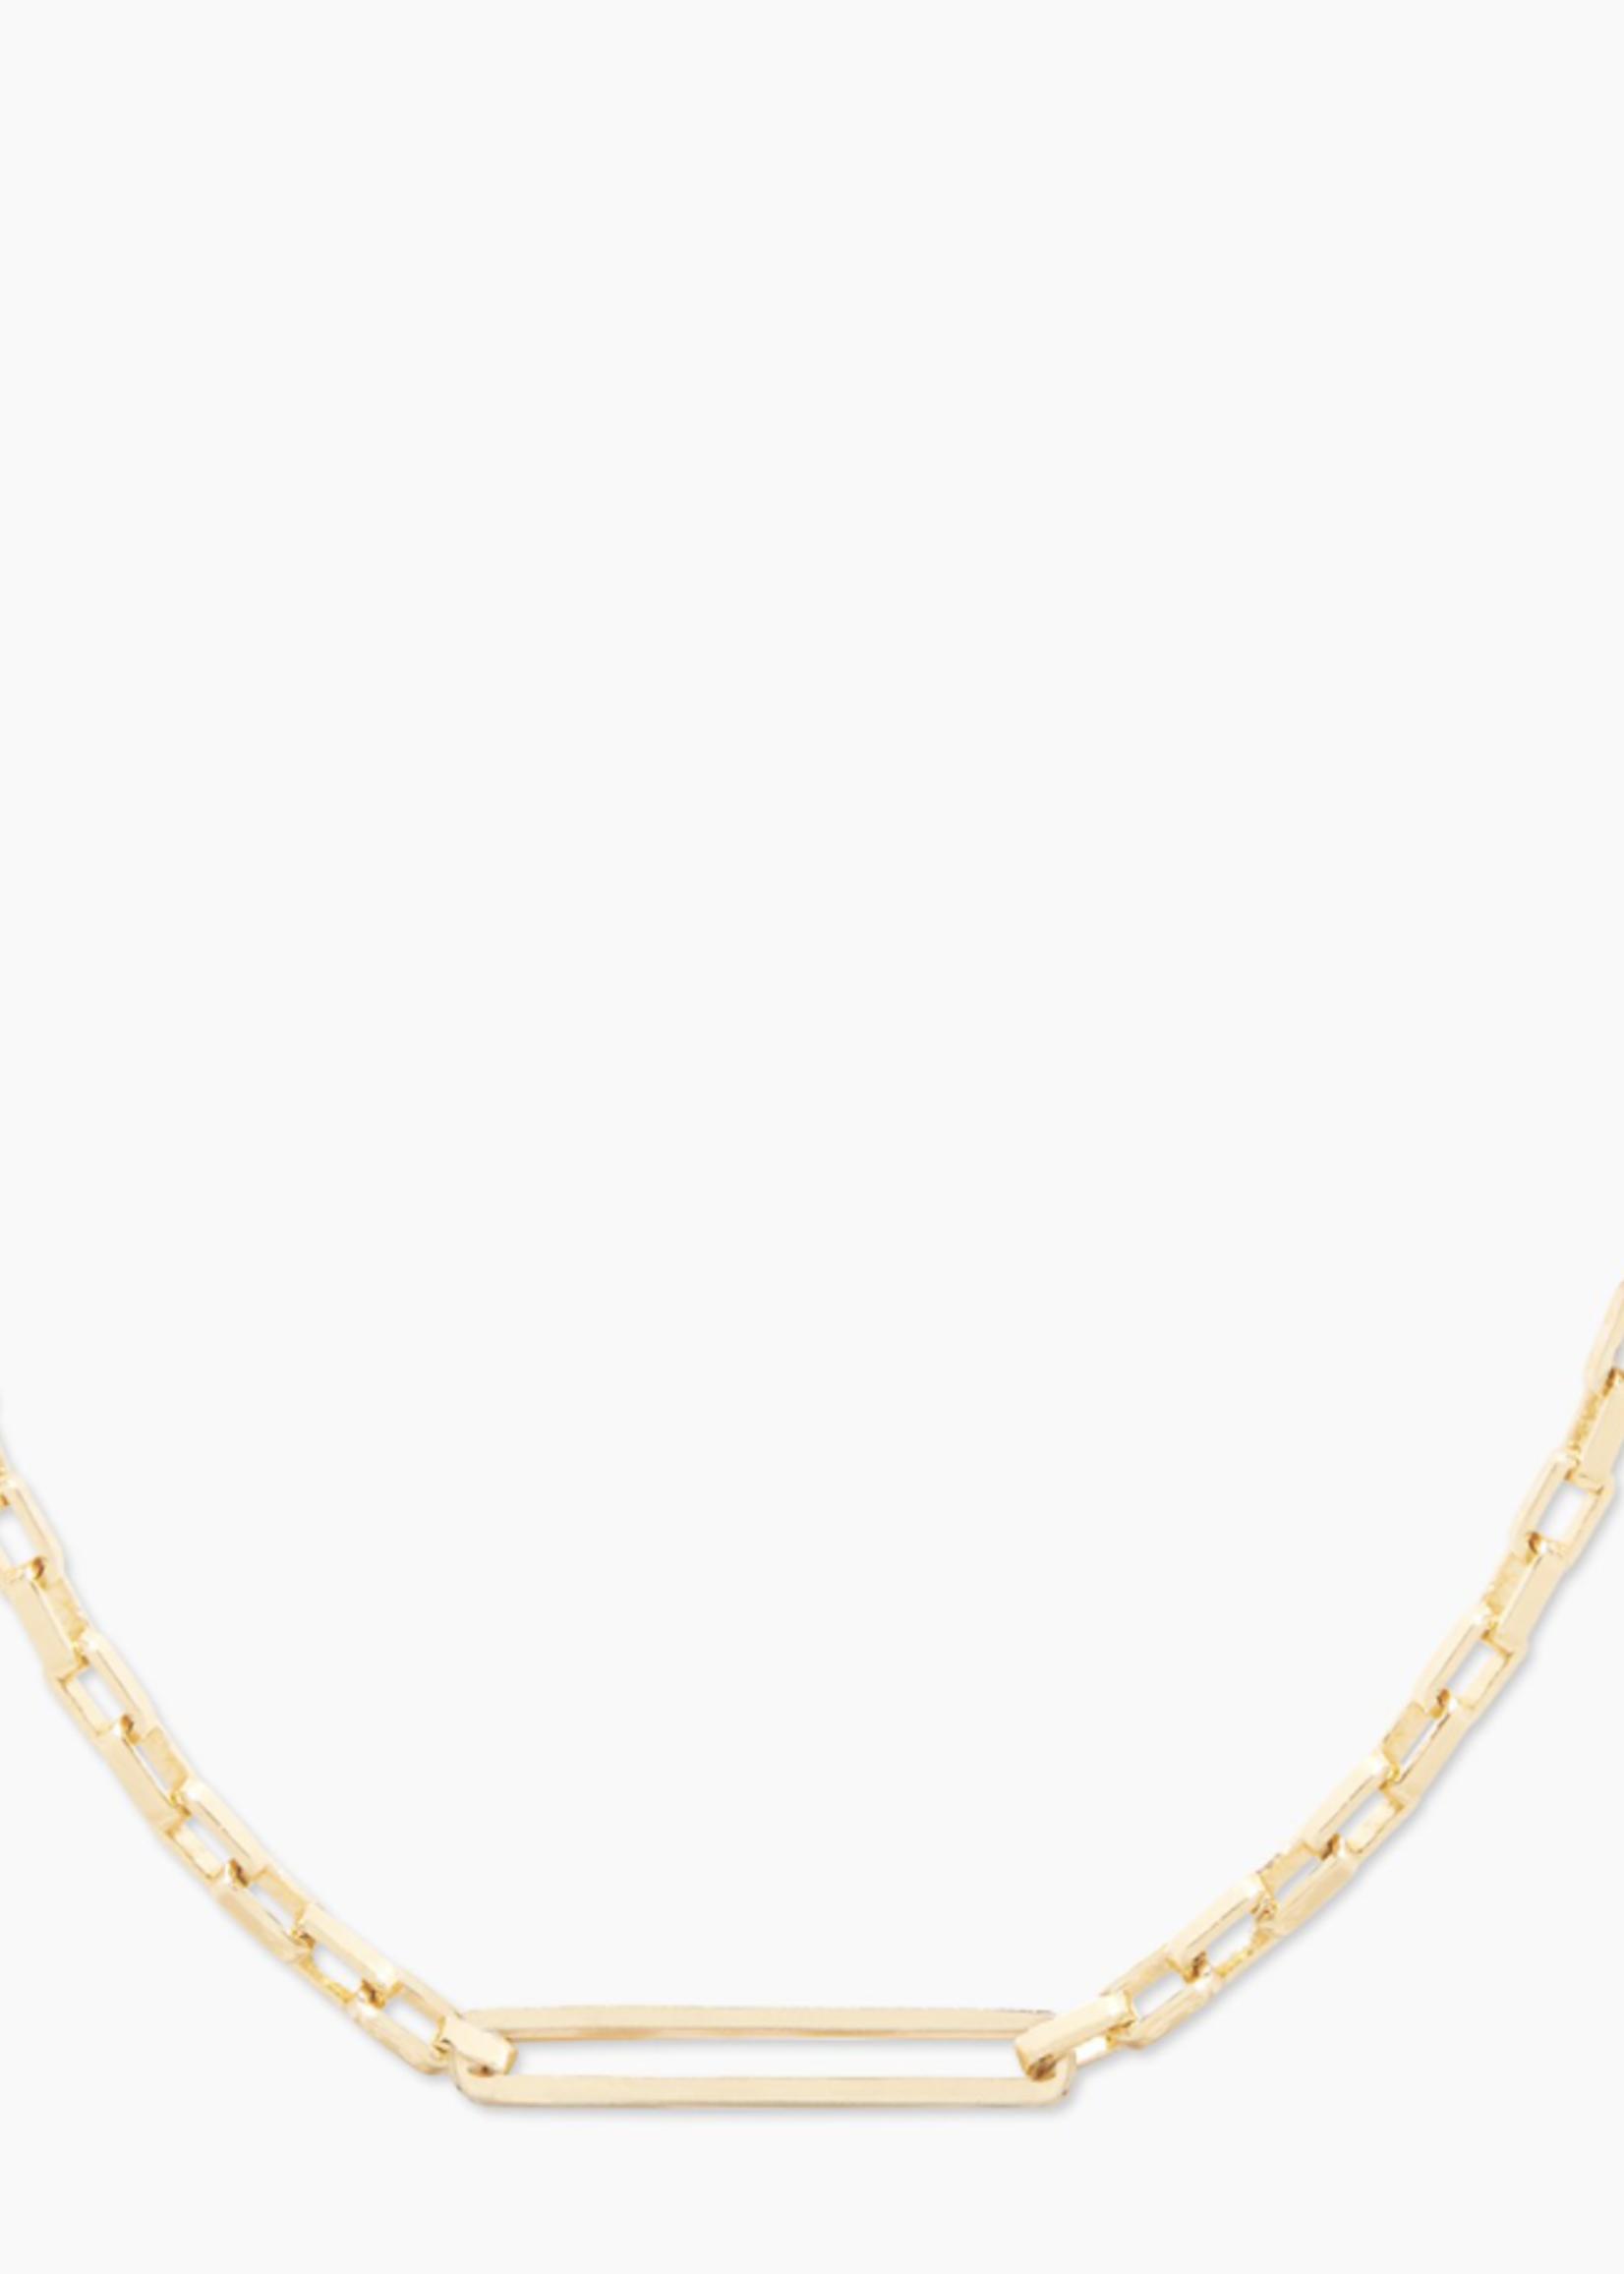 Gorjana Gorjana Nico Delicate Necklace